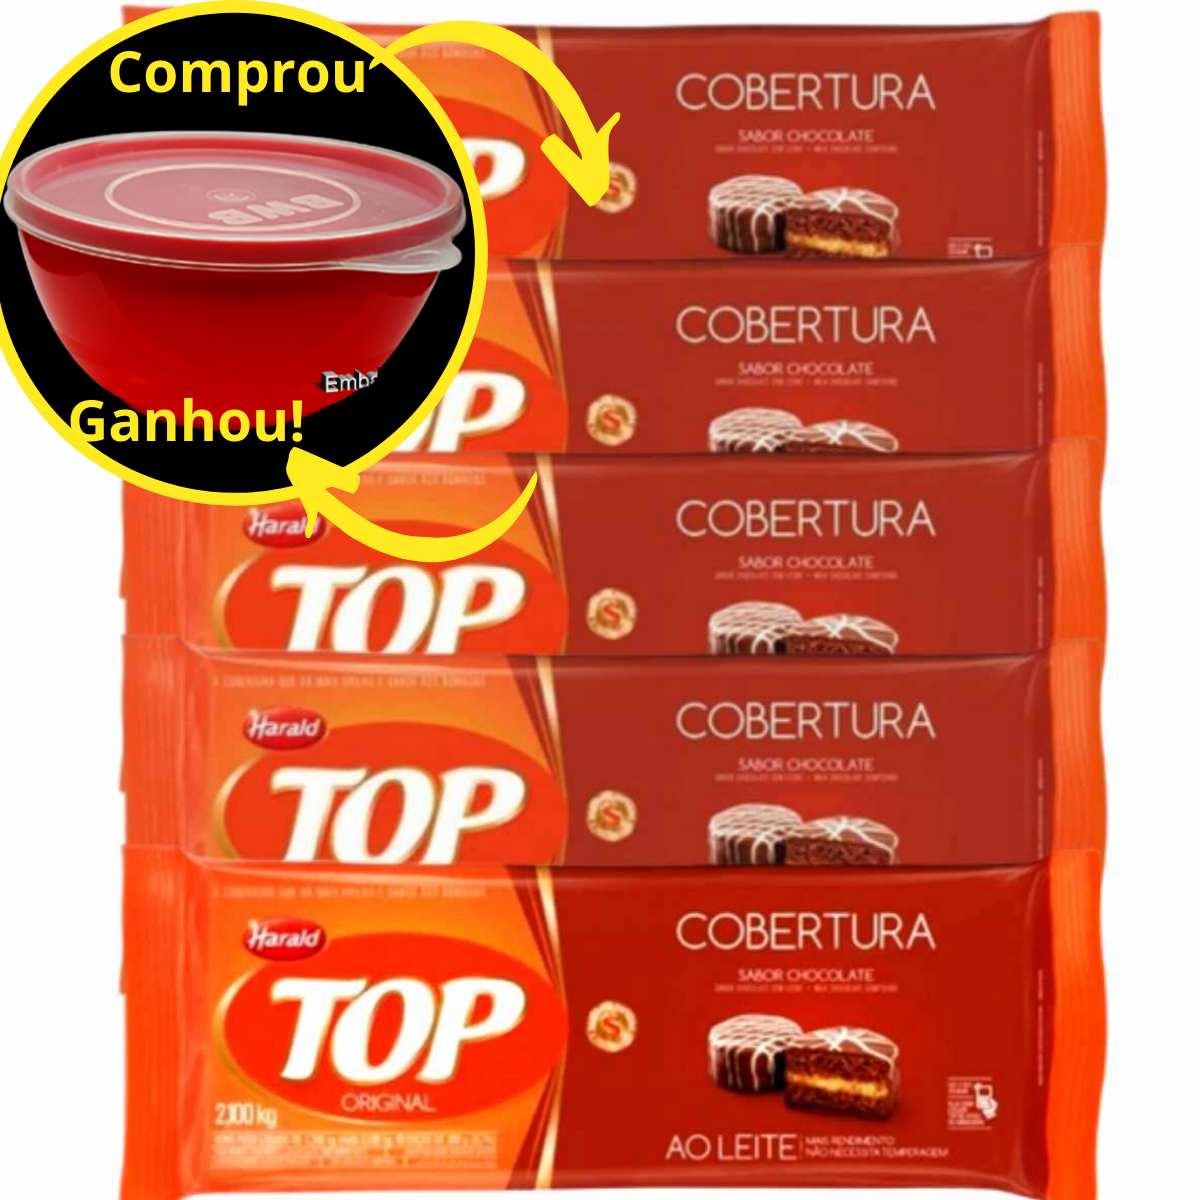 5 Cobertura Fracionada sabor Chocolate Ao Leite 2,1 kg Top Harald